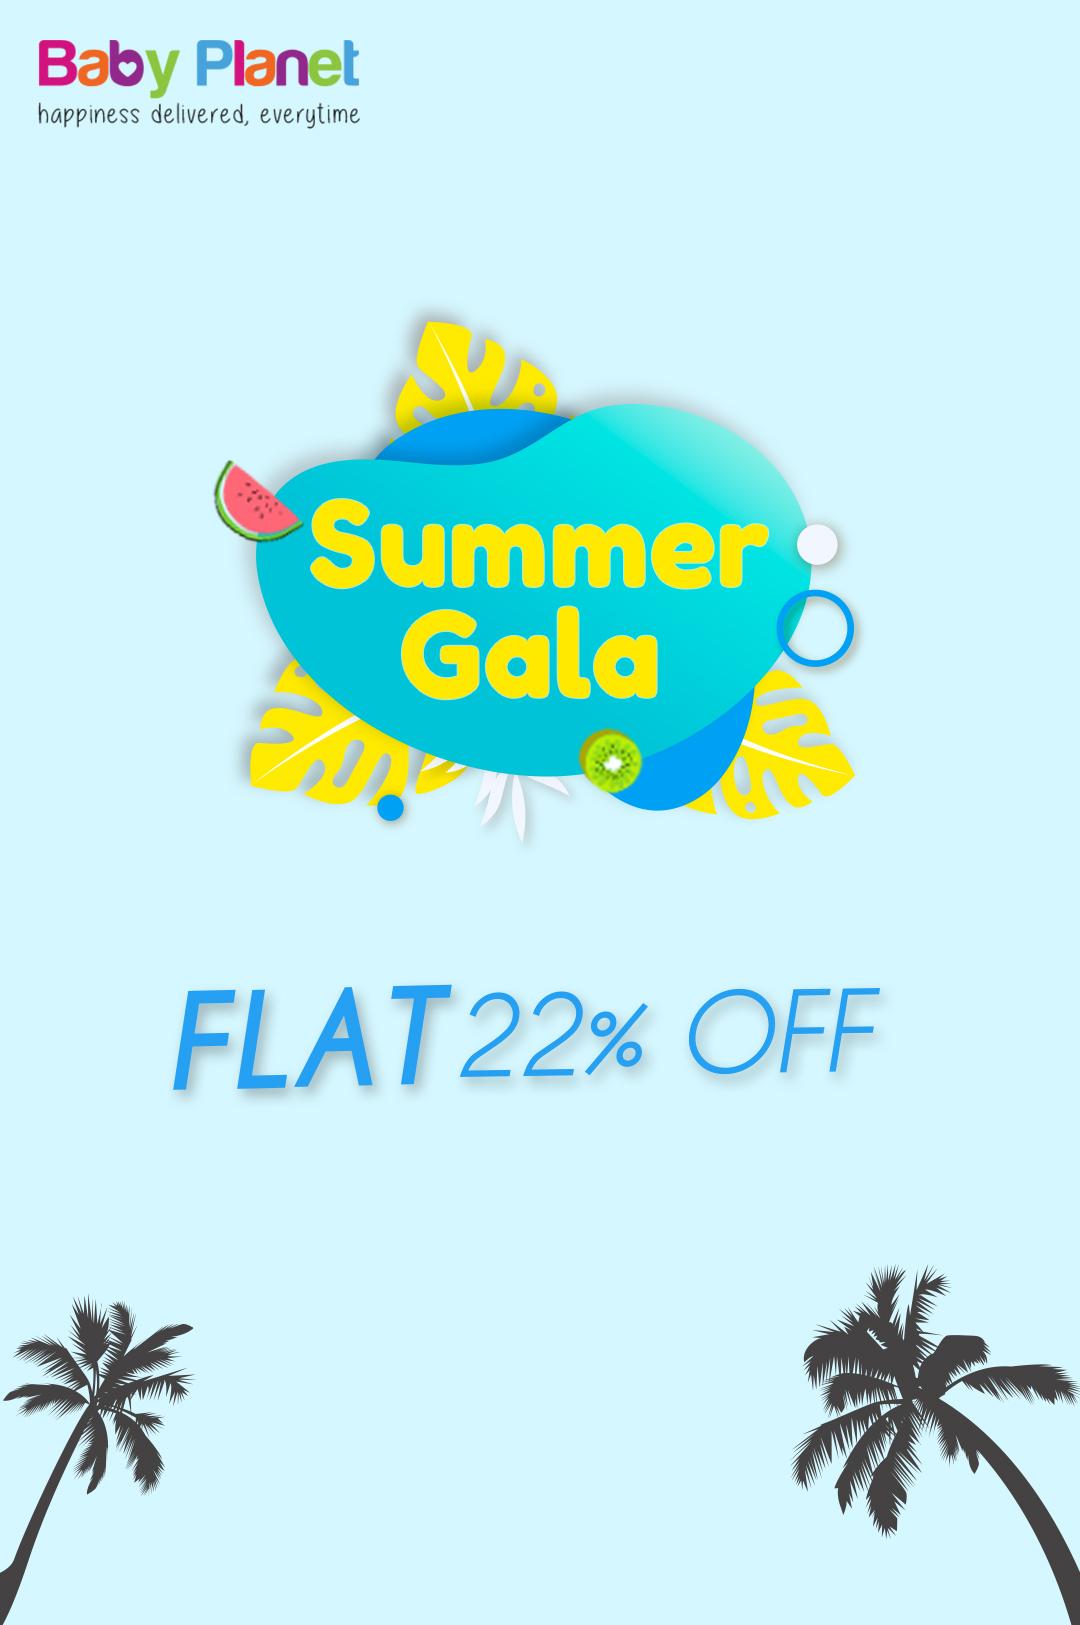 Baby Planet - Summer Gala Sale